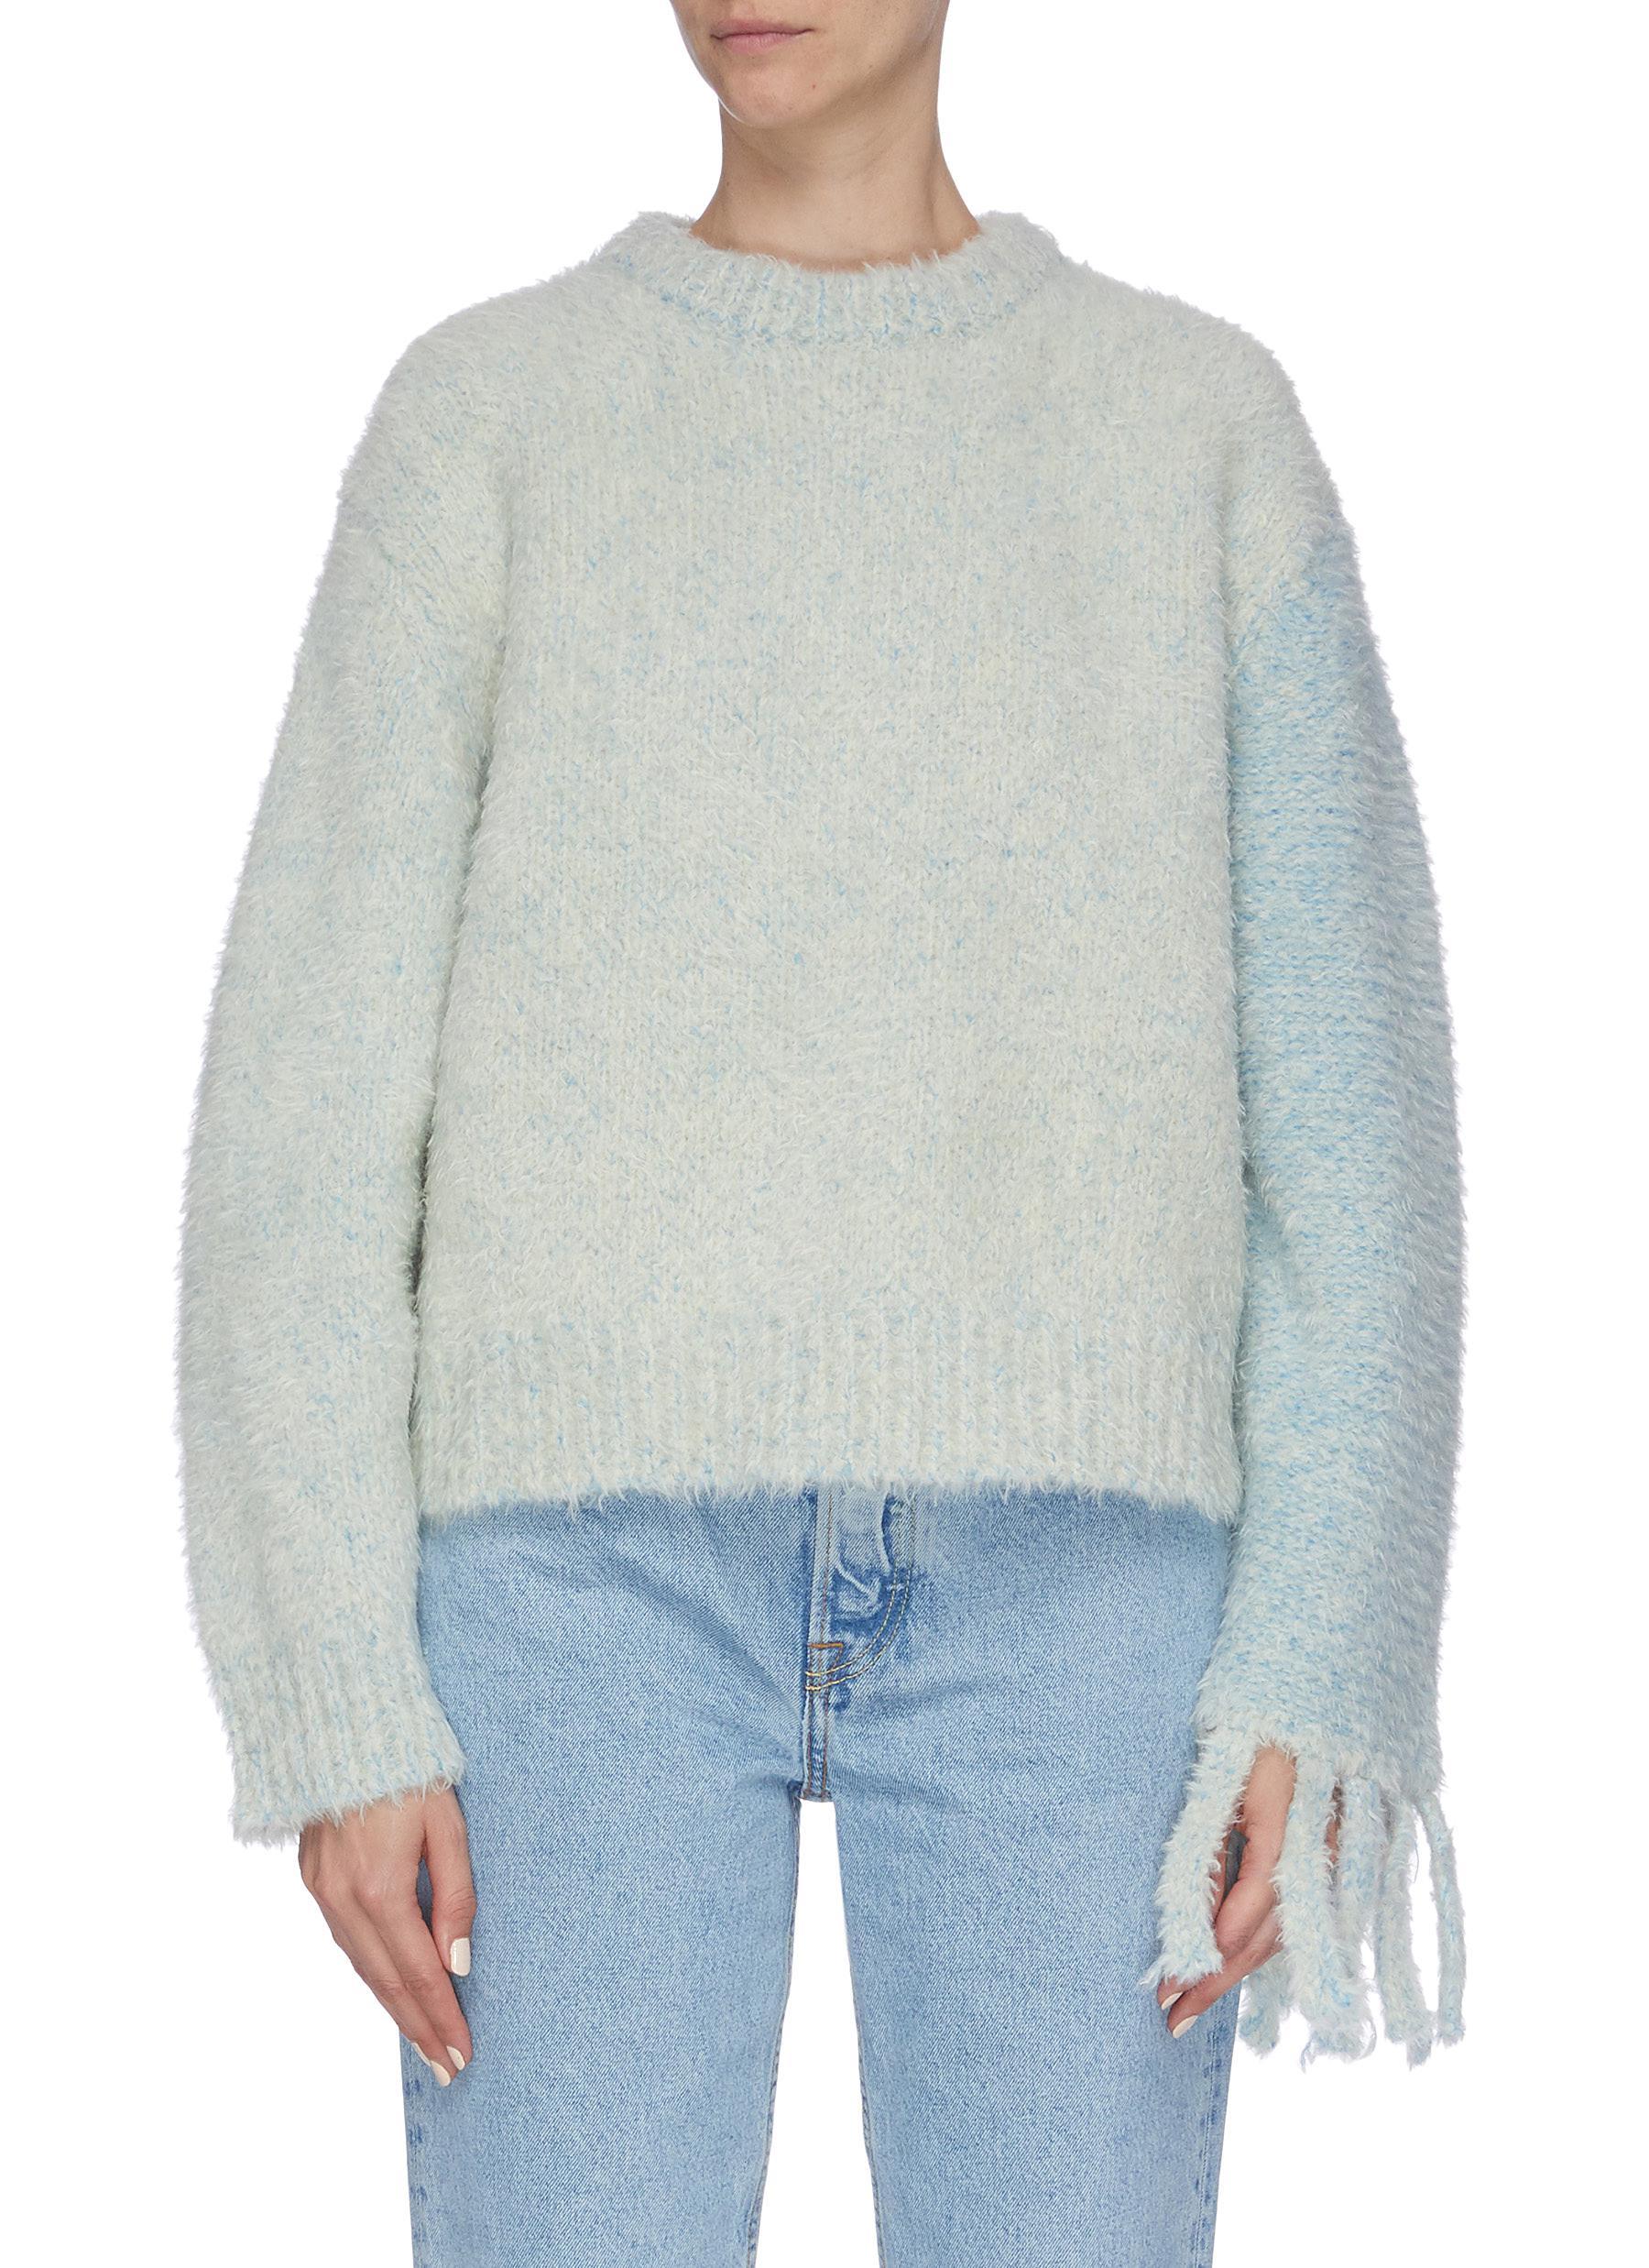 Colourblock sleeve tassel cuff sweater by Short Sentence